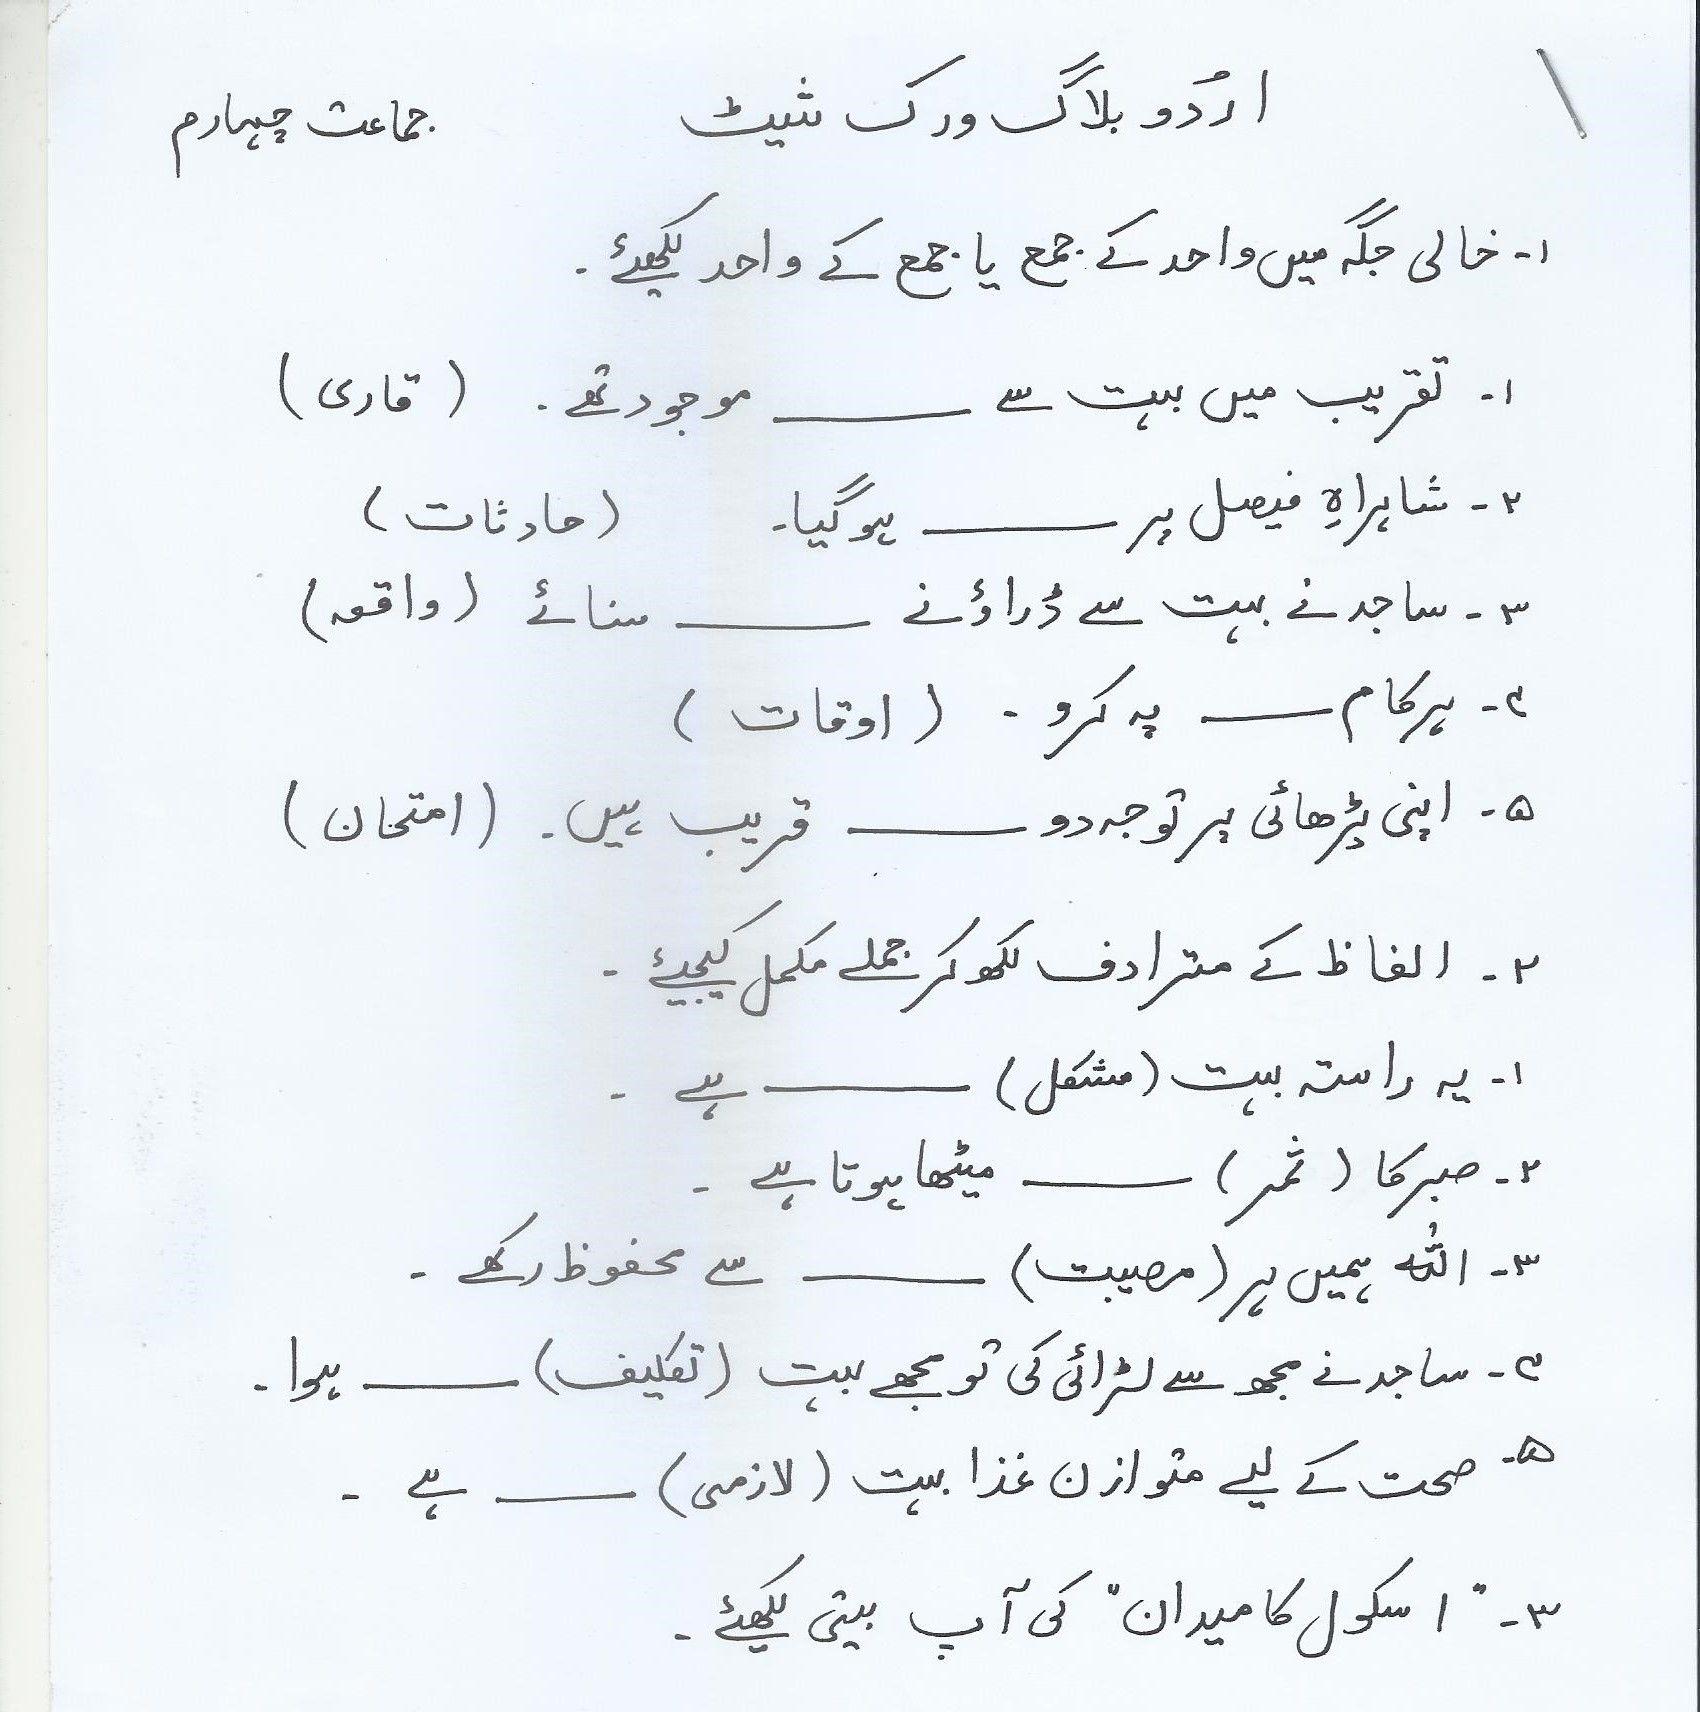 Pin By Fatima Iftikhar On Education